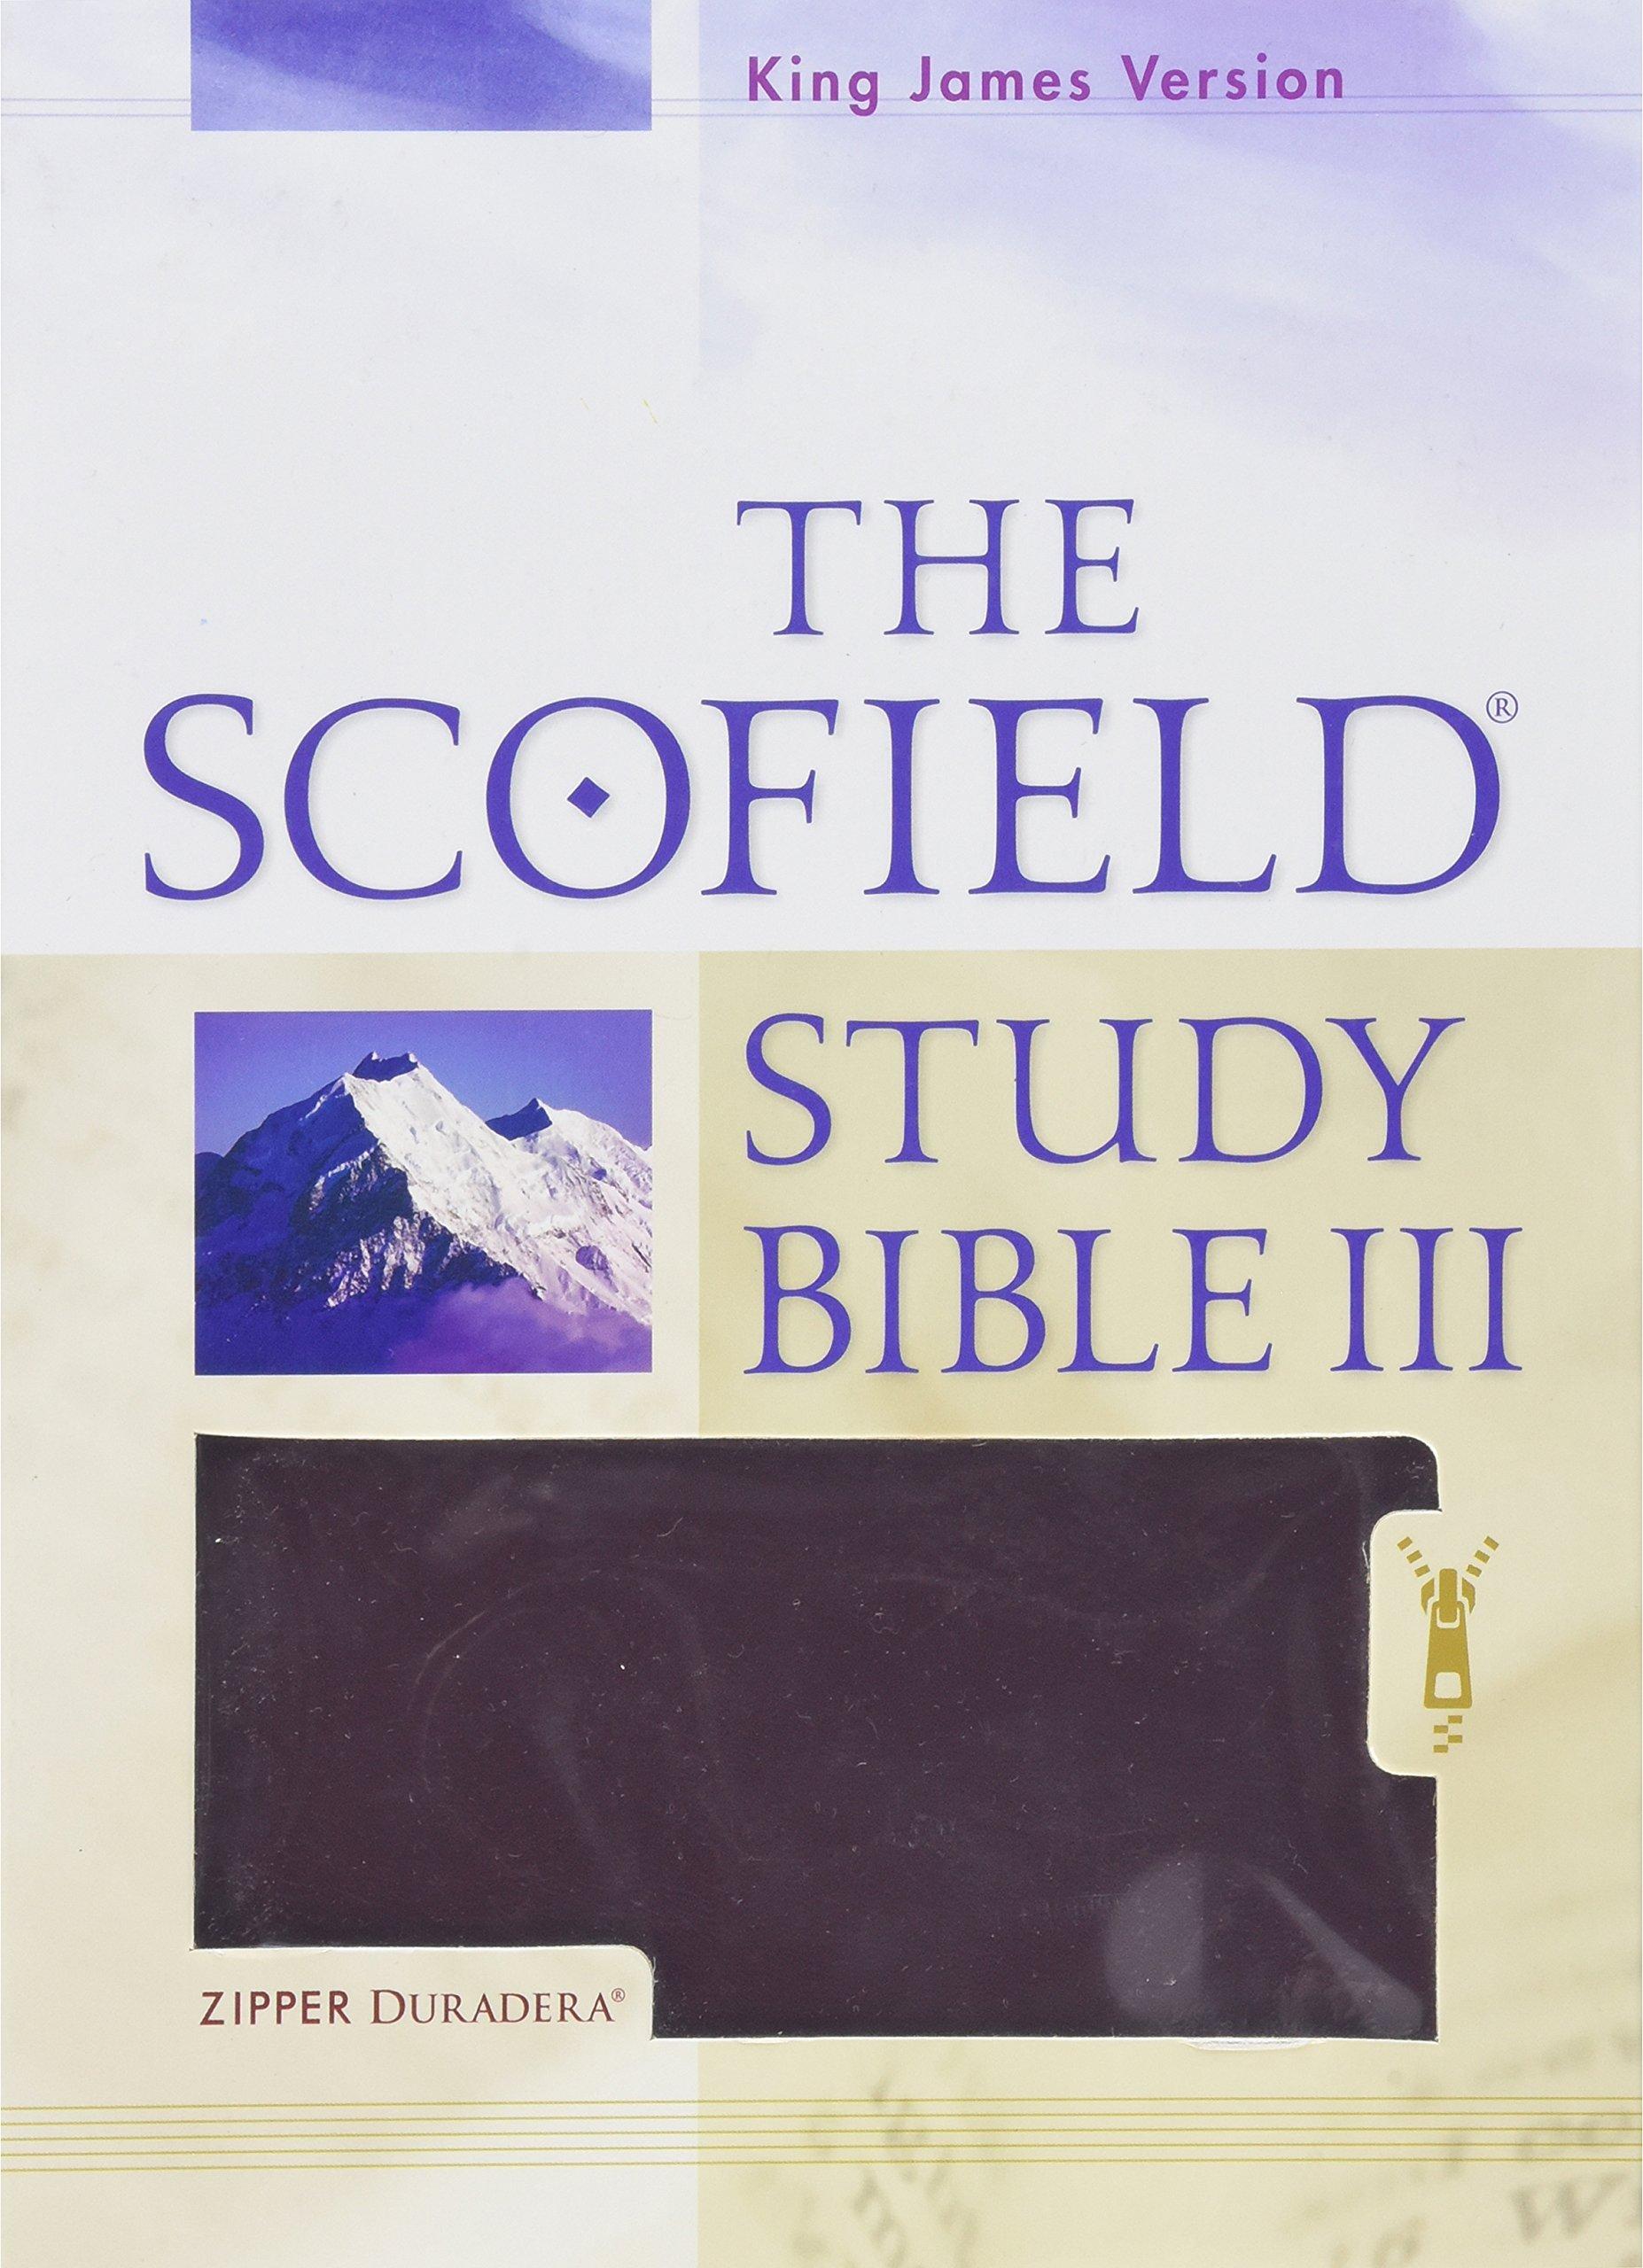 The Scofield® Study Bible III, KJV ebook